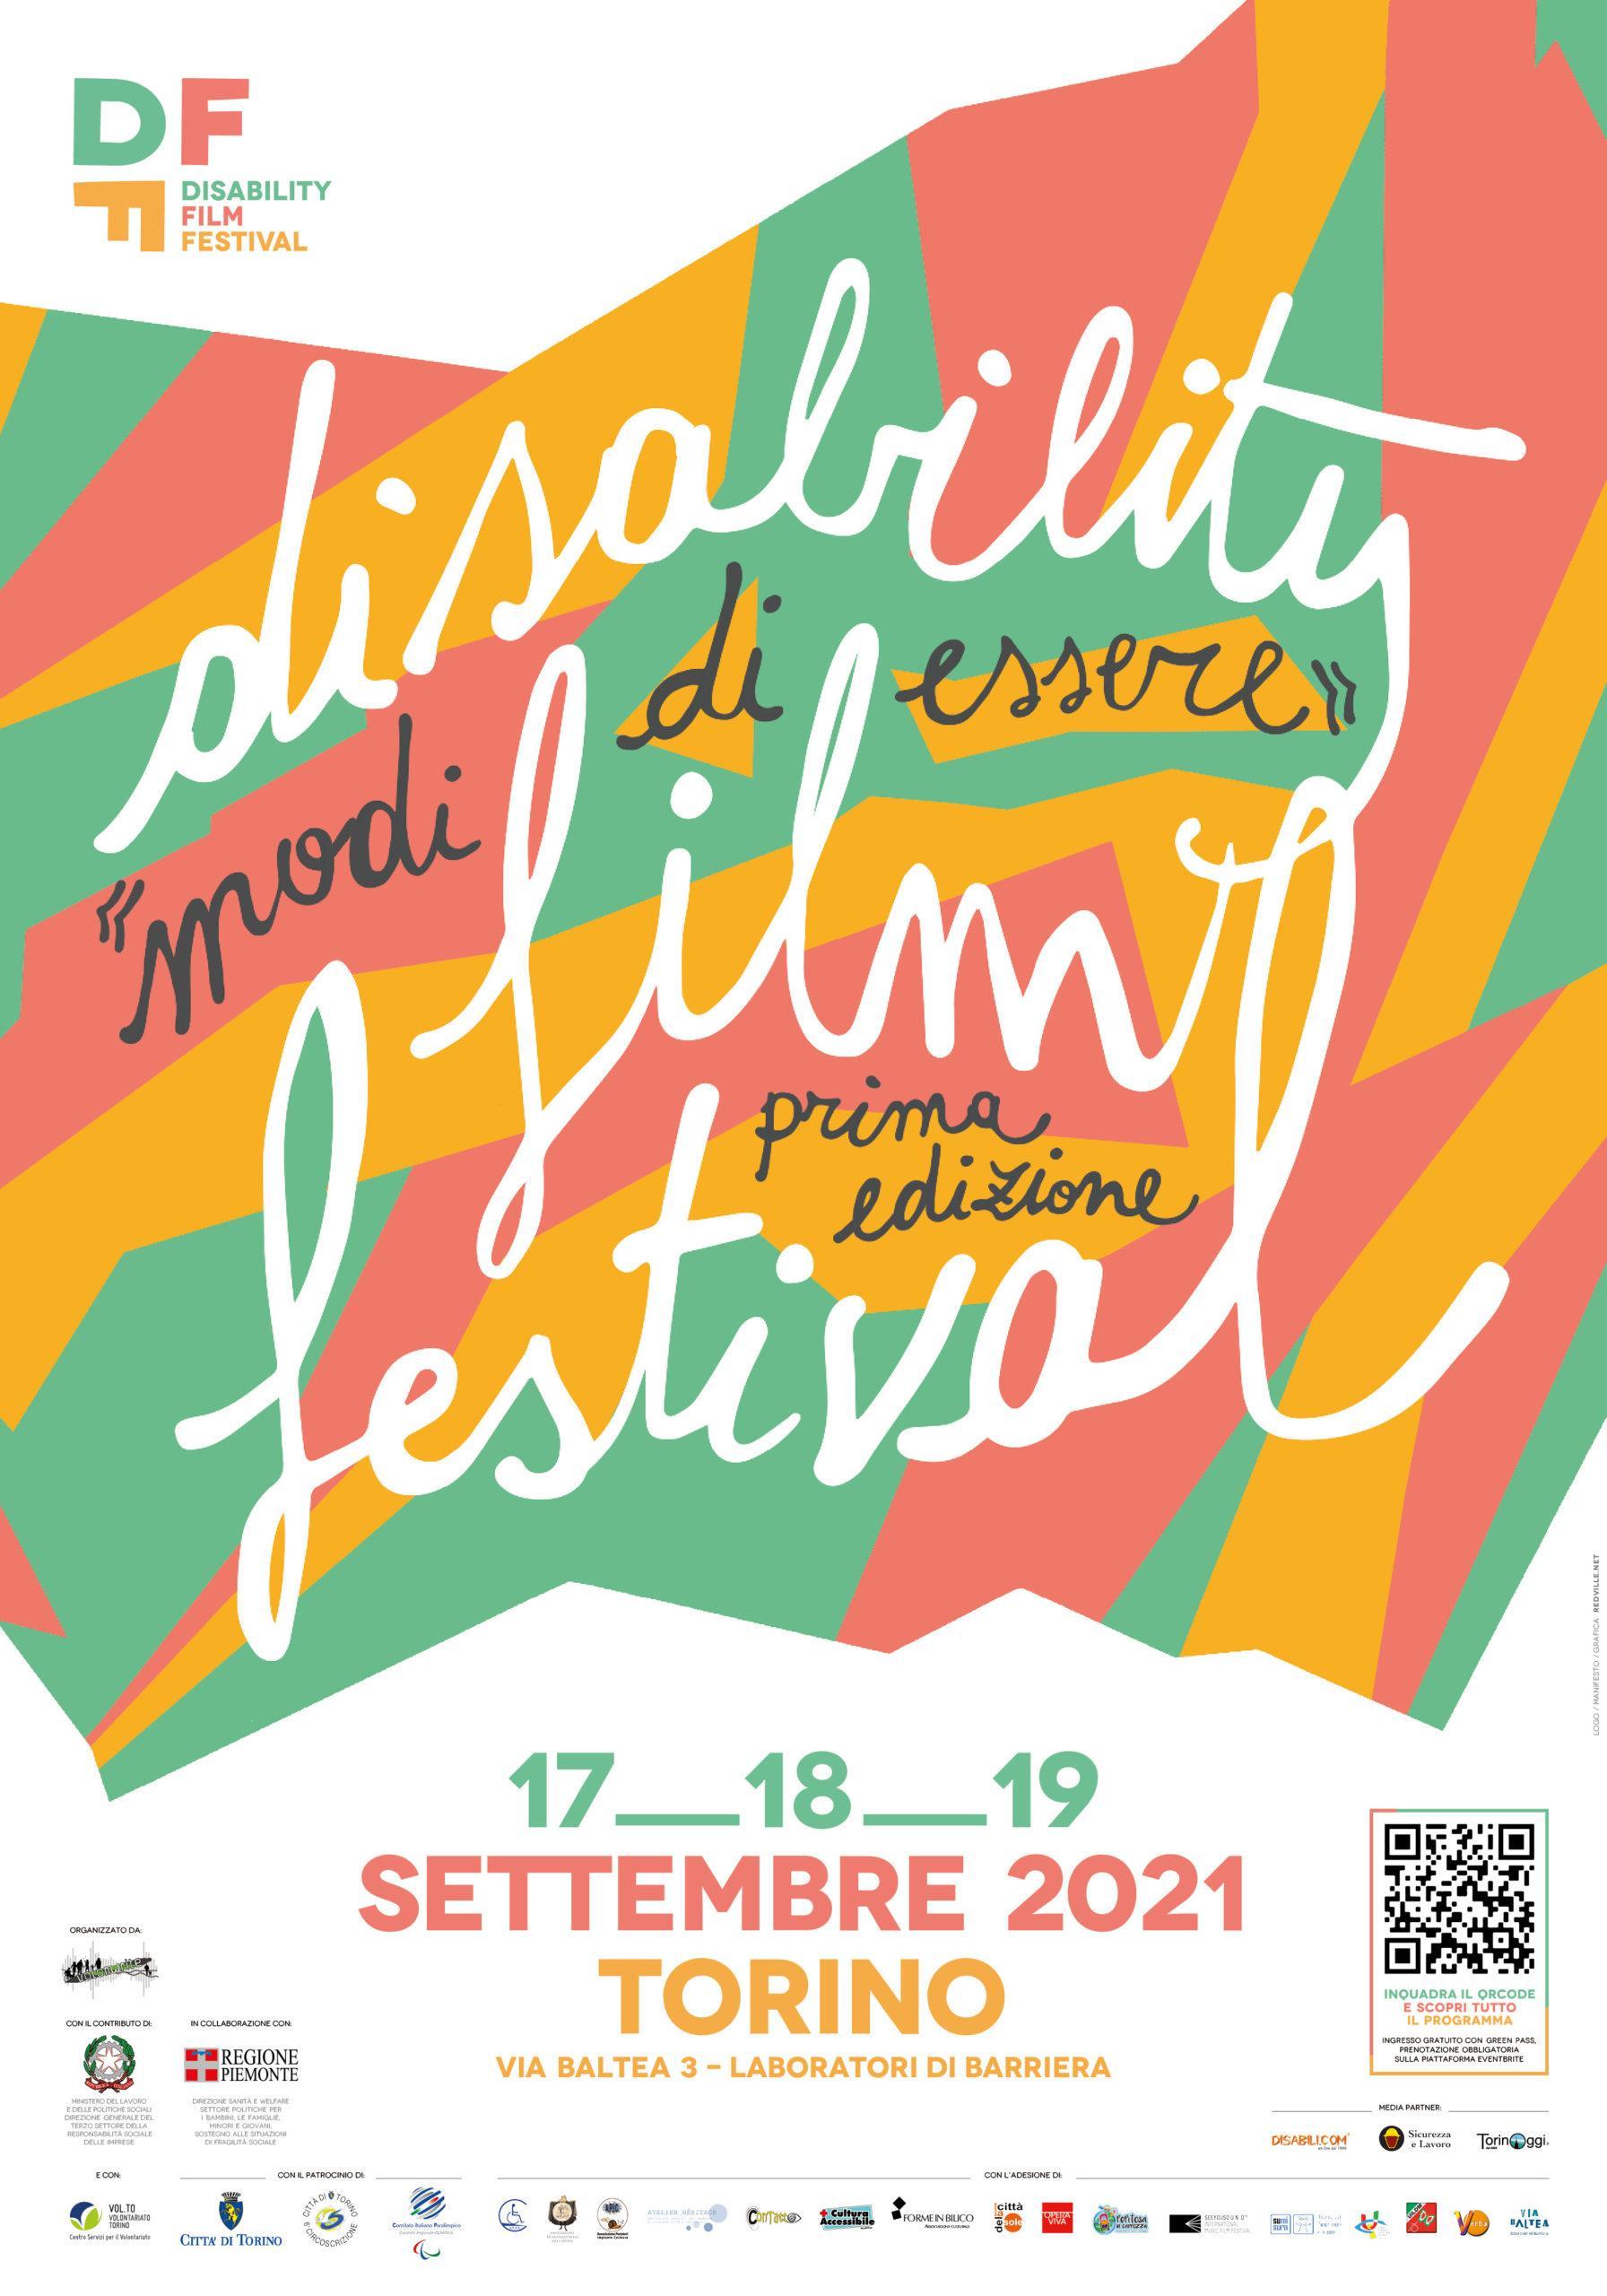 locandina Disability Film Festival